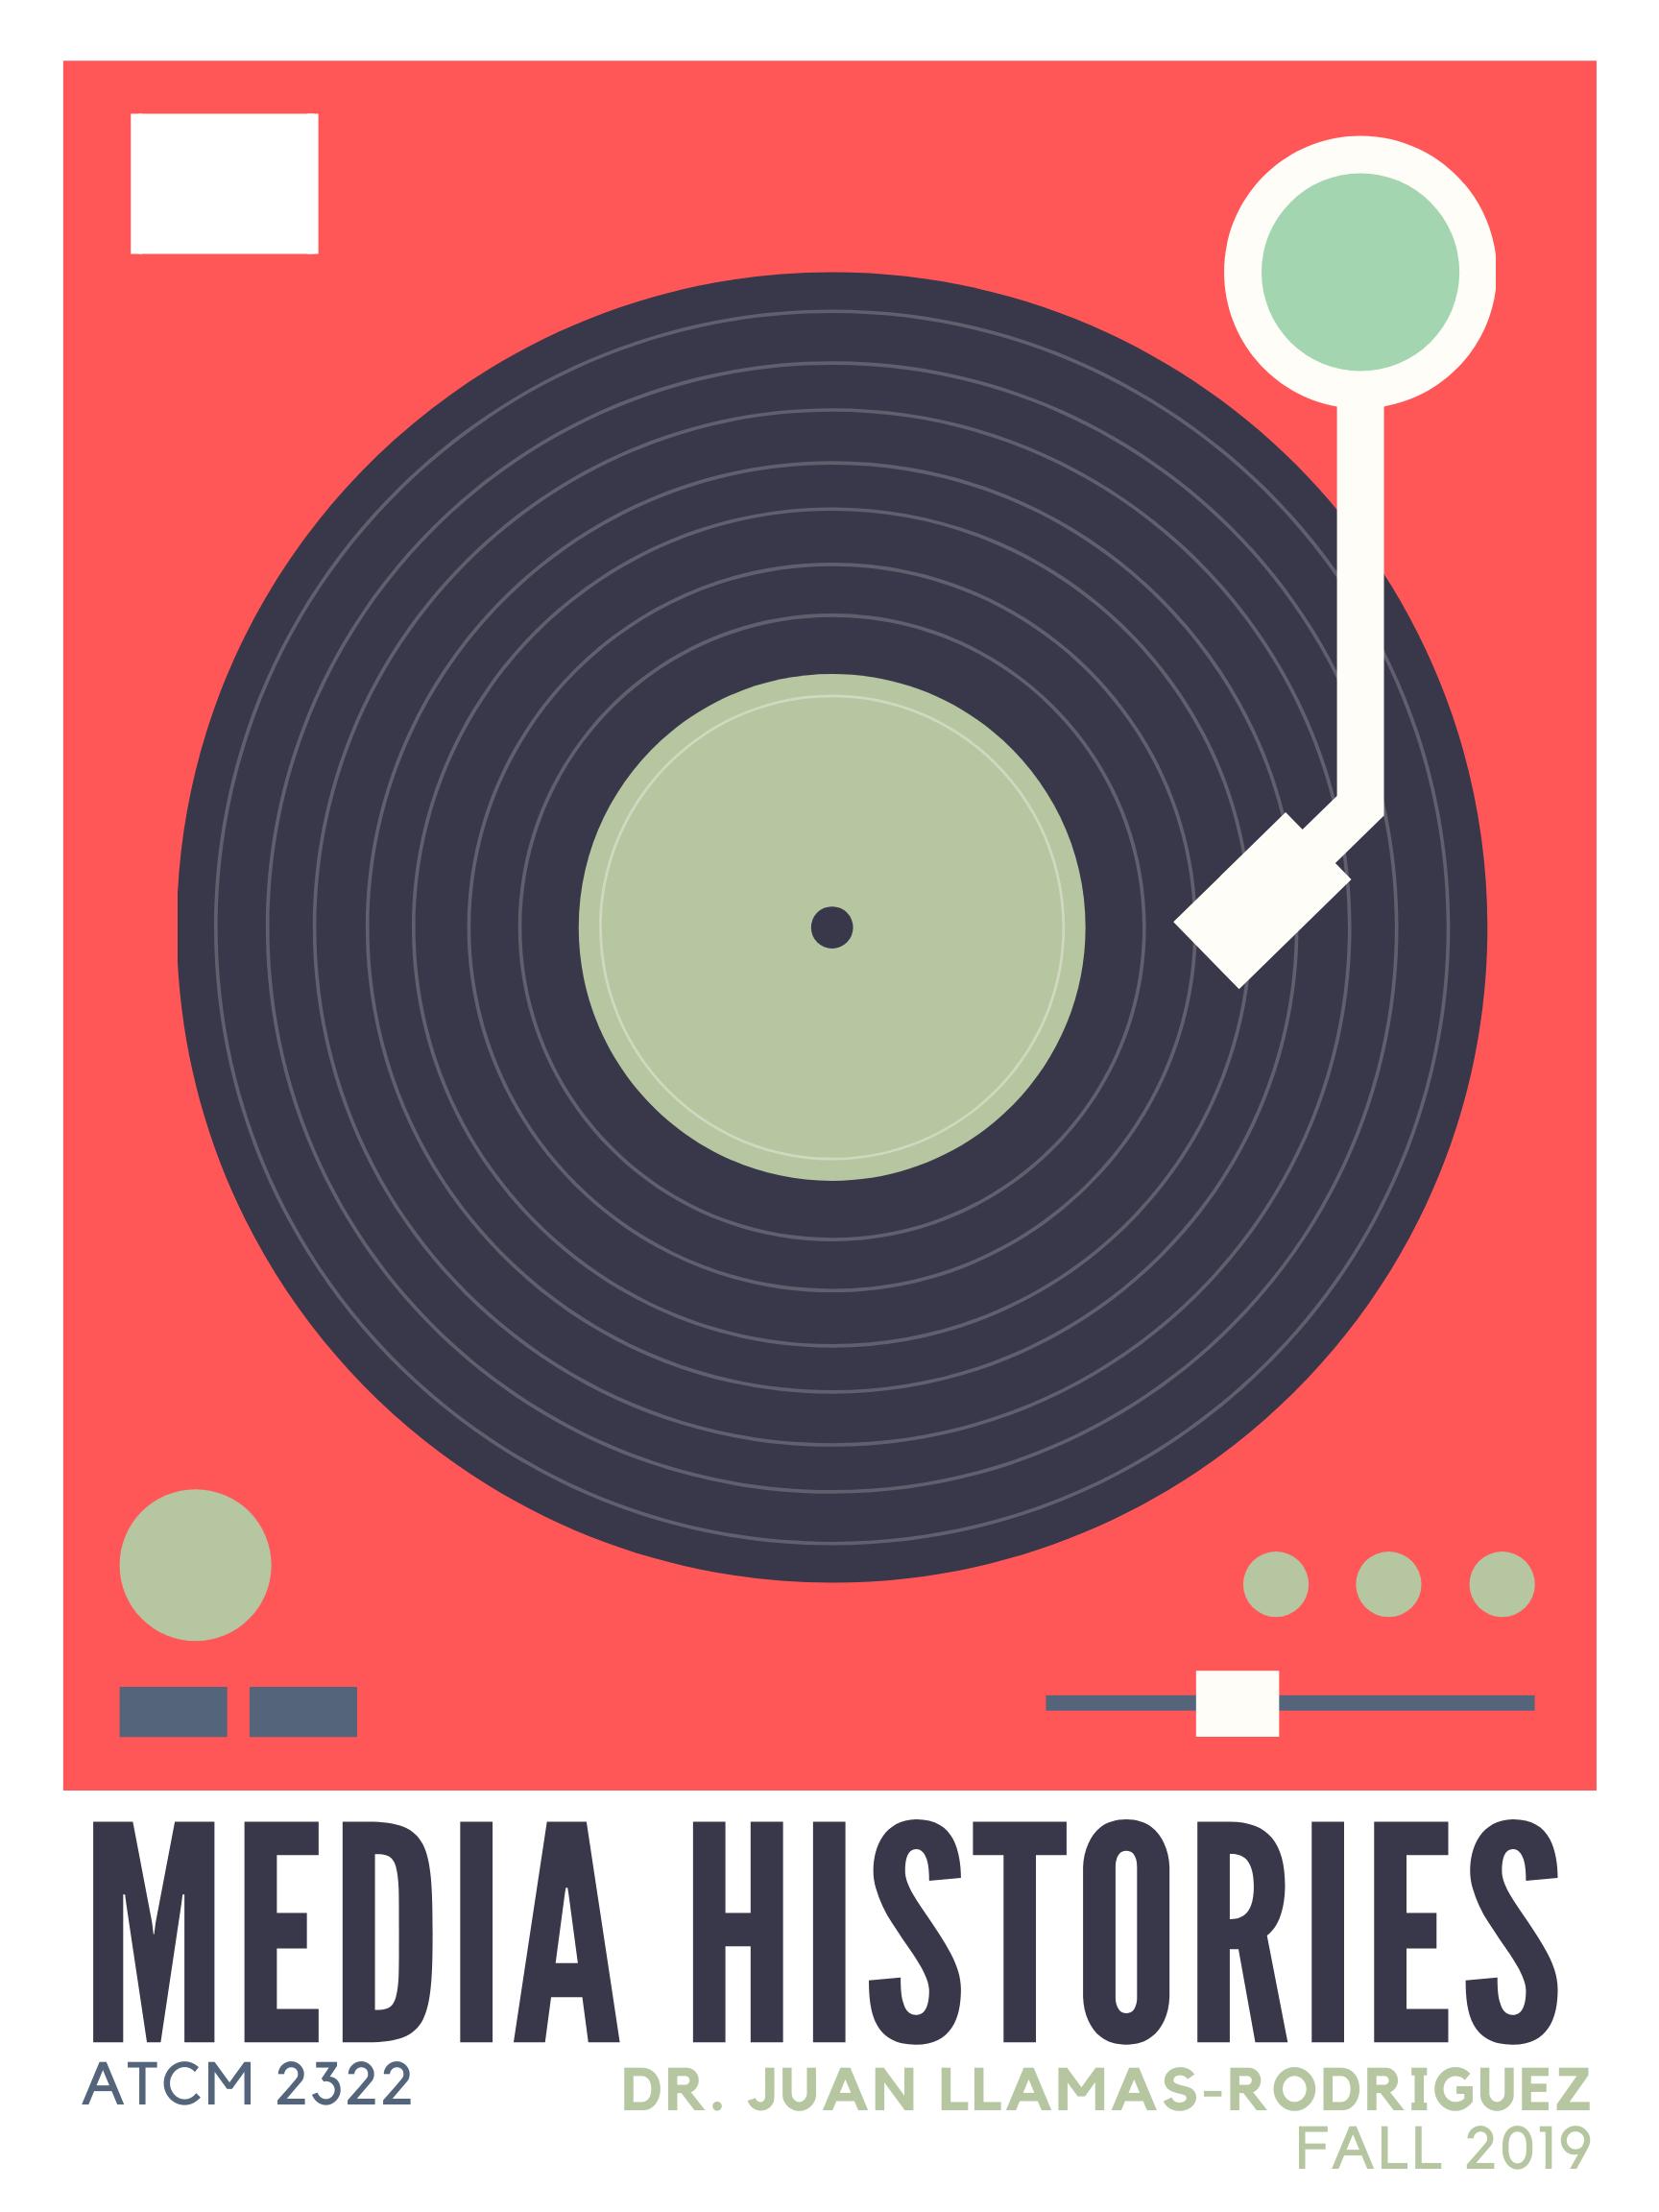 Media Histories